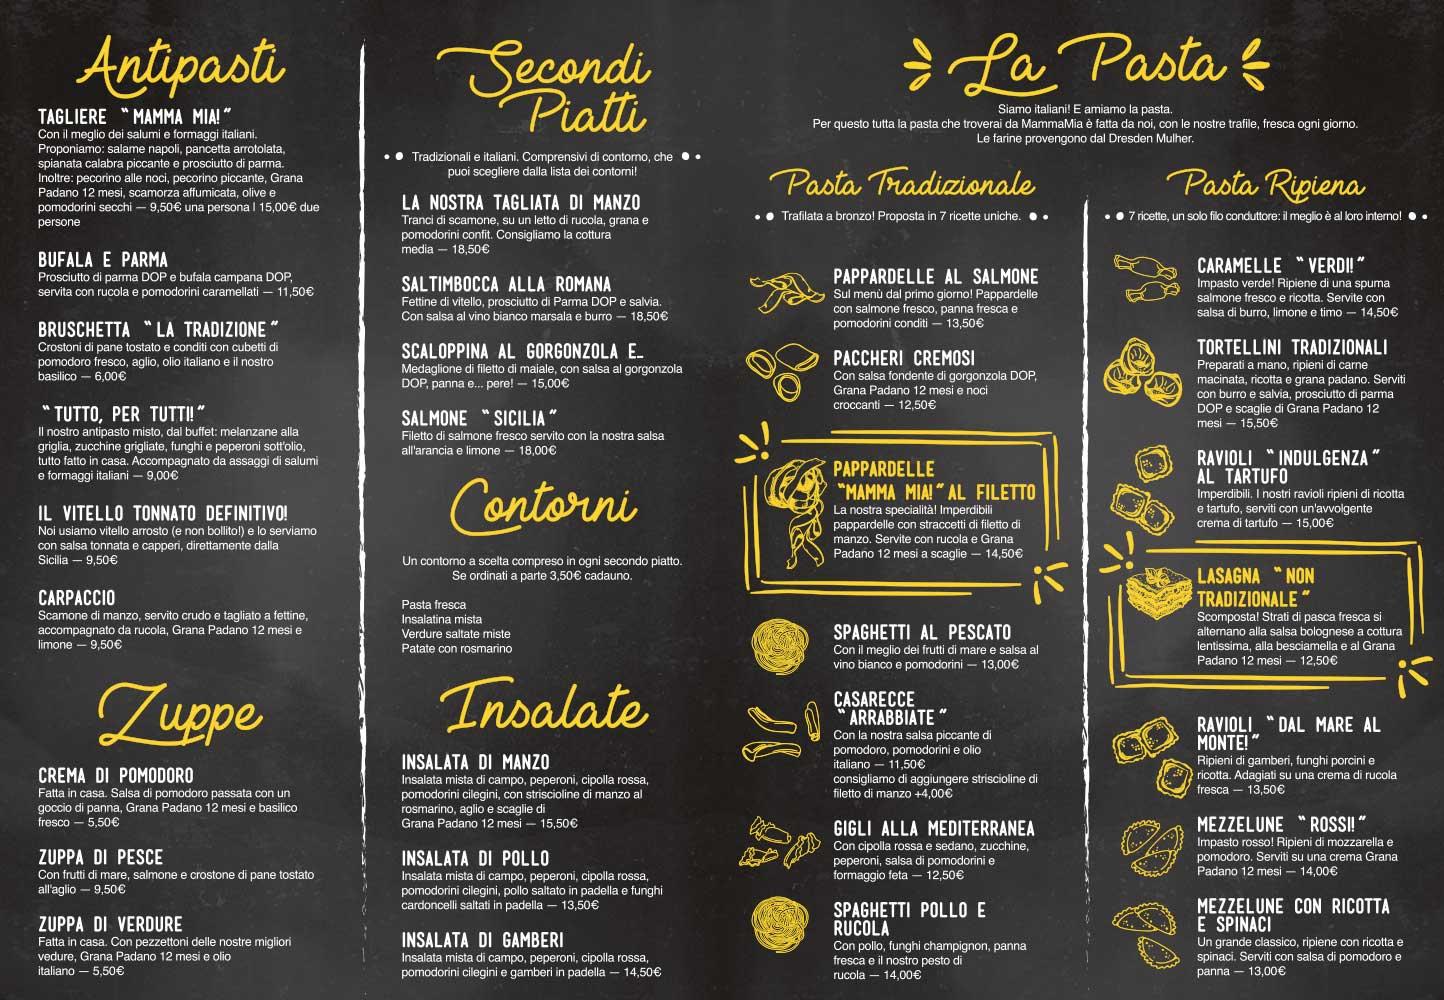 mammamia-speisekarte-2017-dresden-italiener-restaurant-italien